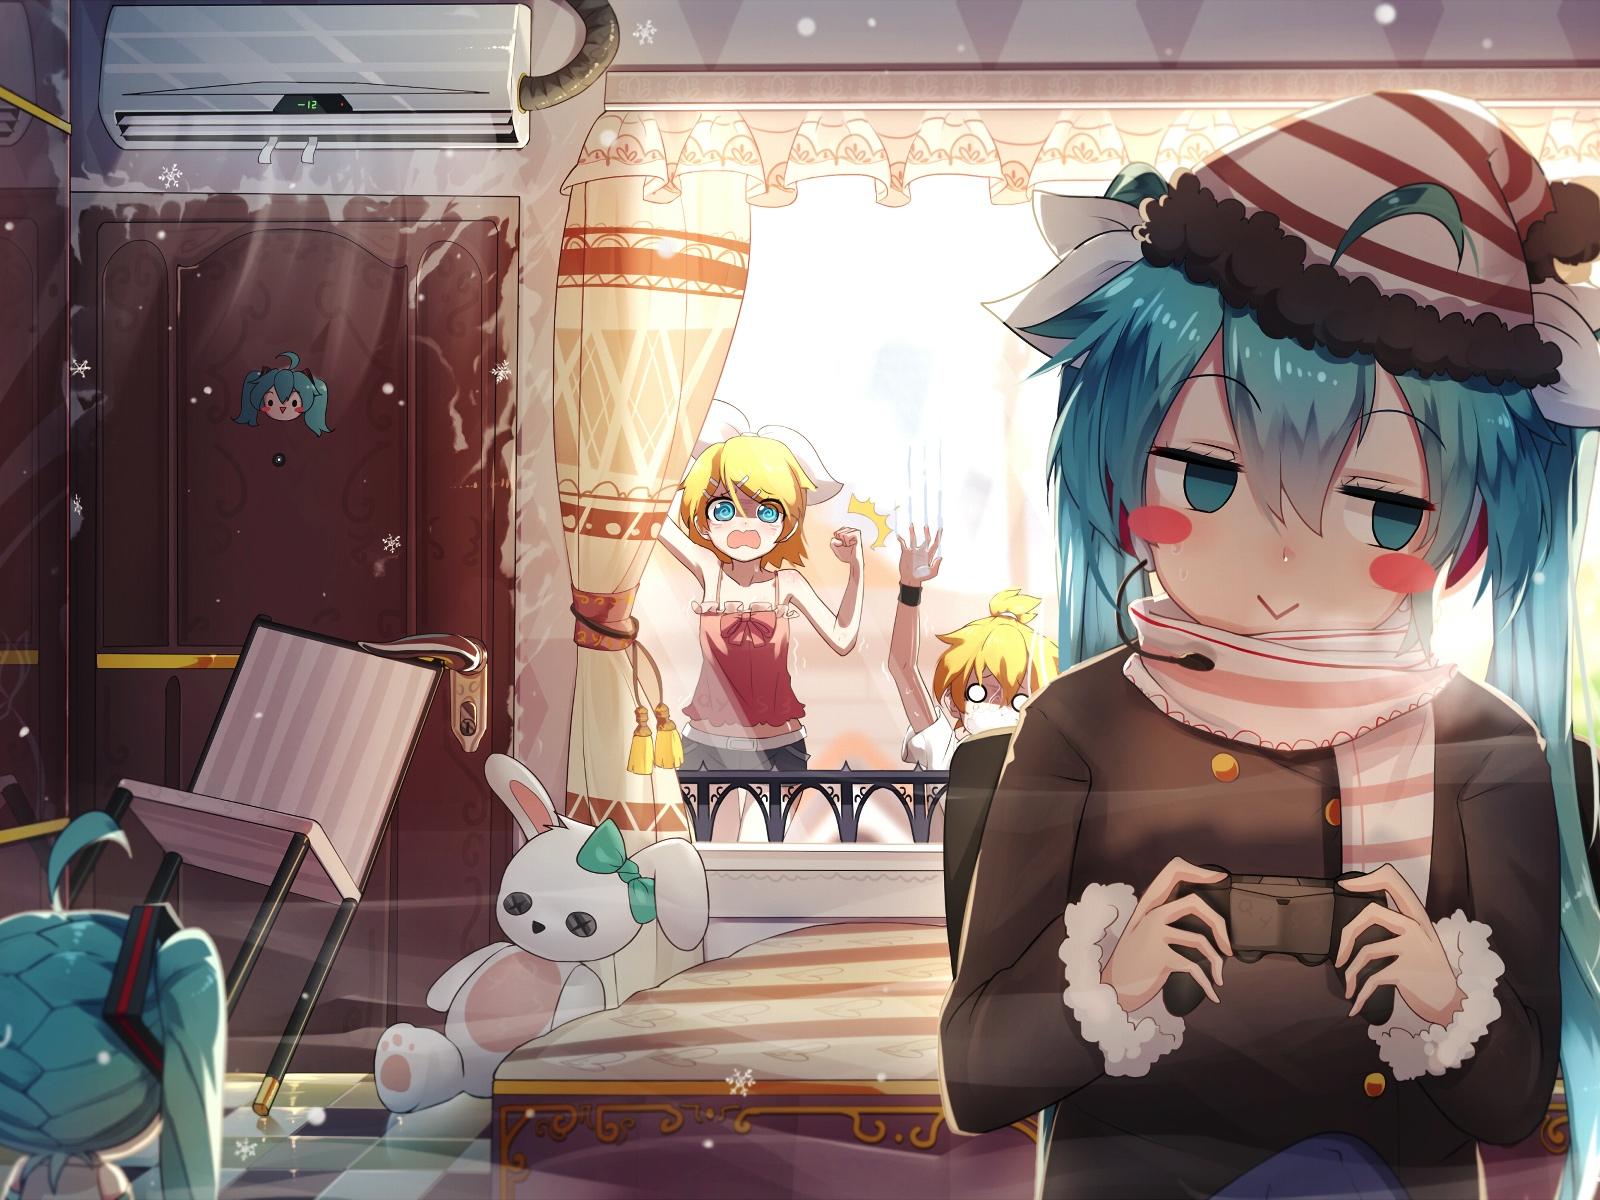 Download 1600x1200 Wallpaper Cute, Hatsune Miku, Playing, Game